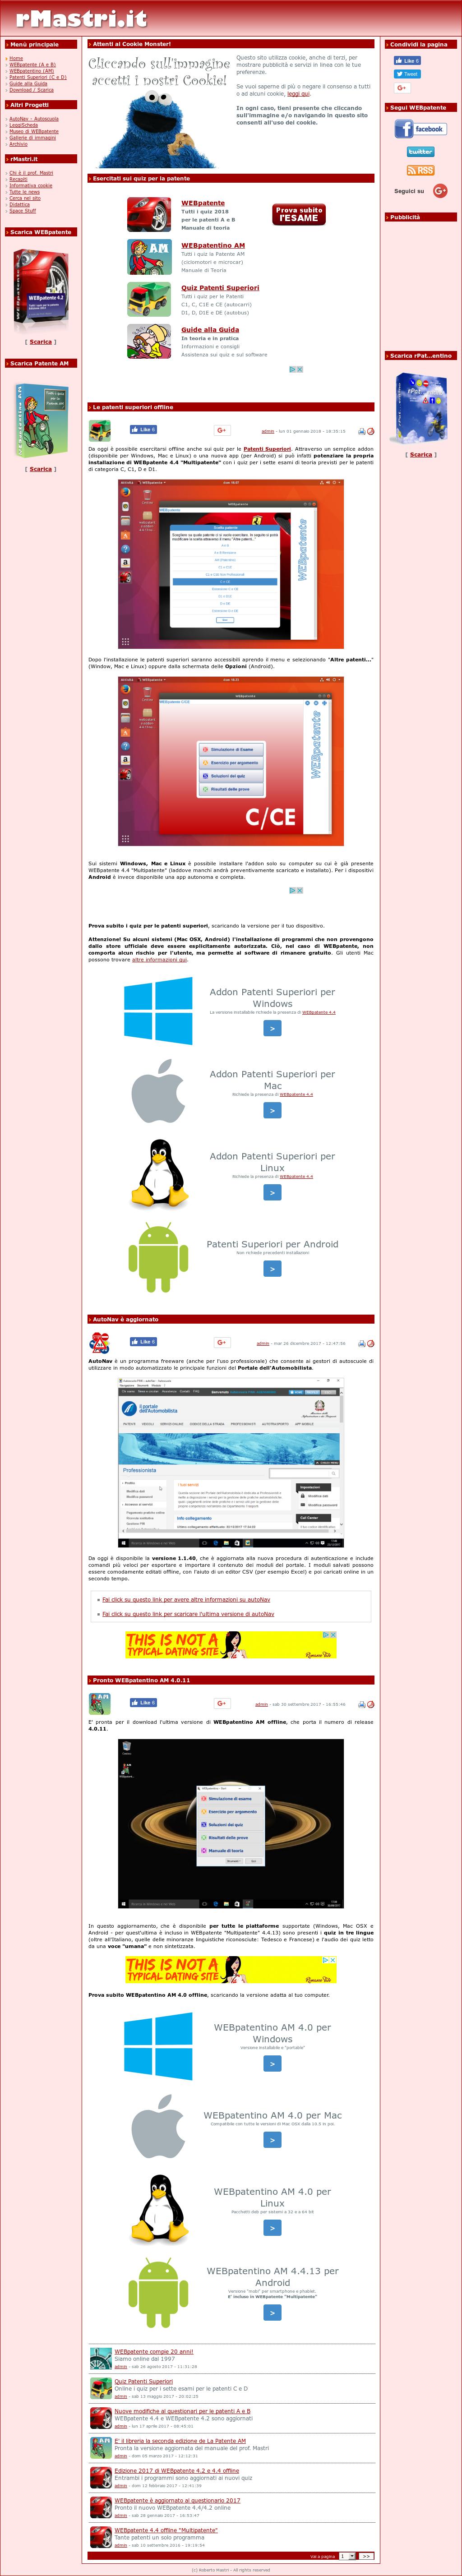 webpatente 2015